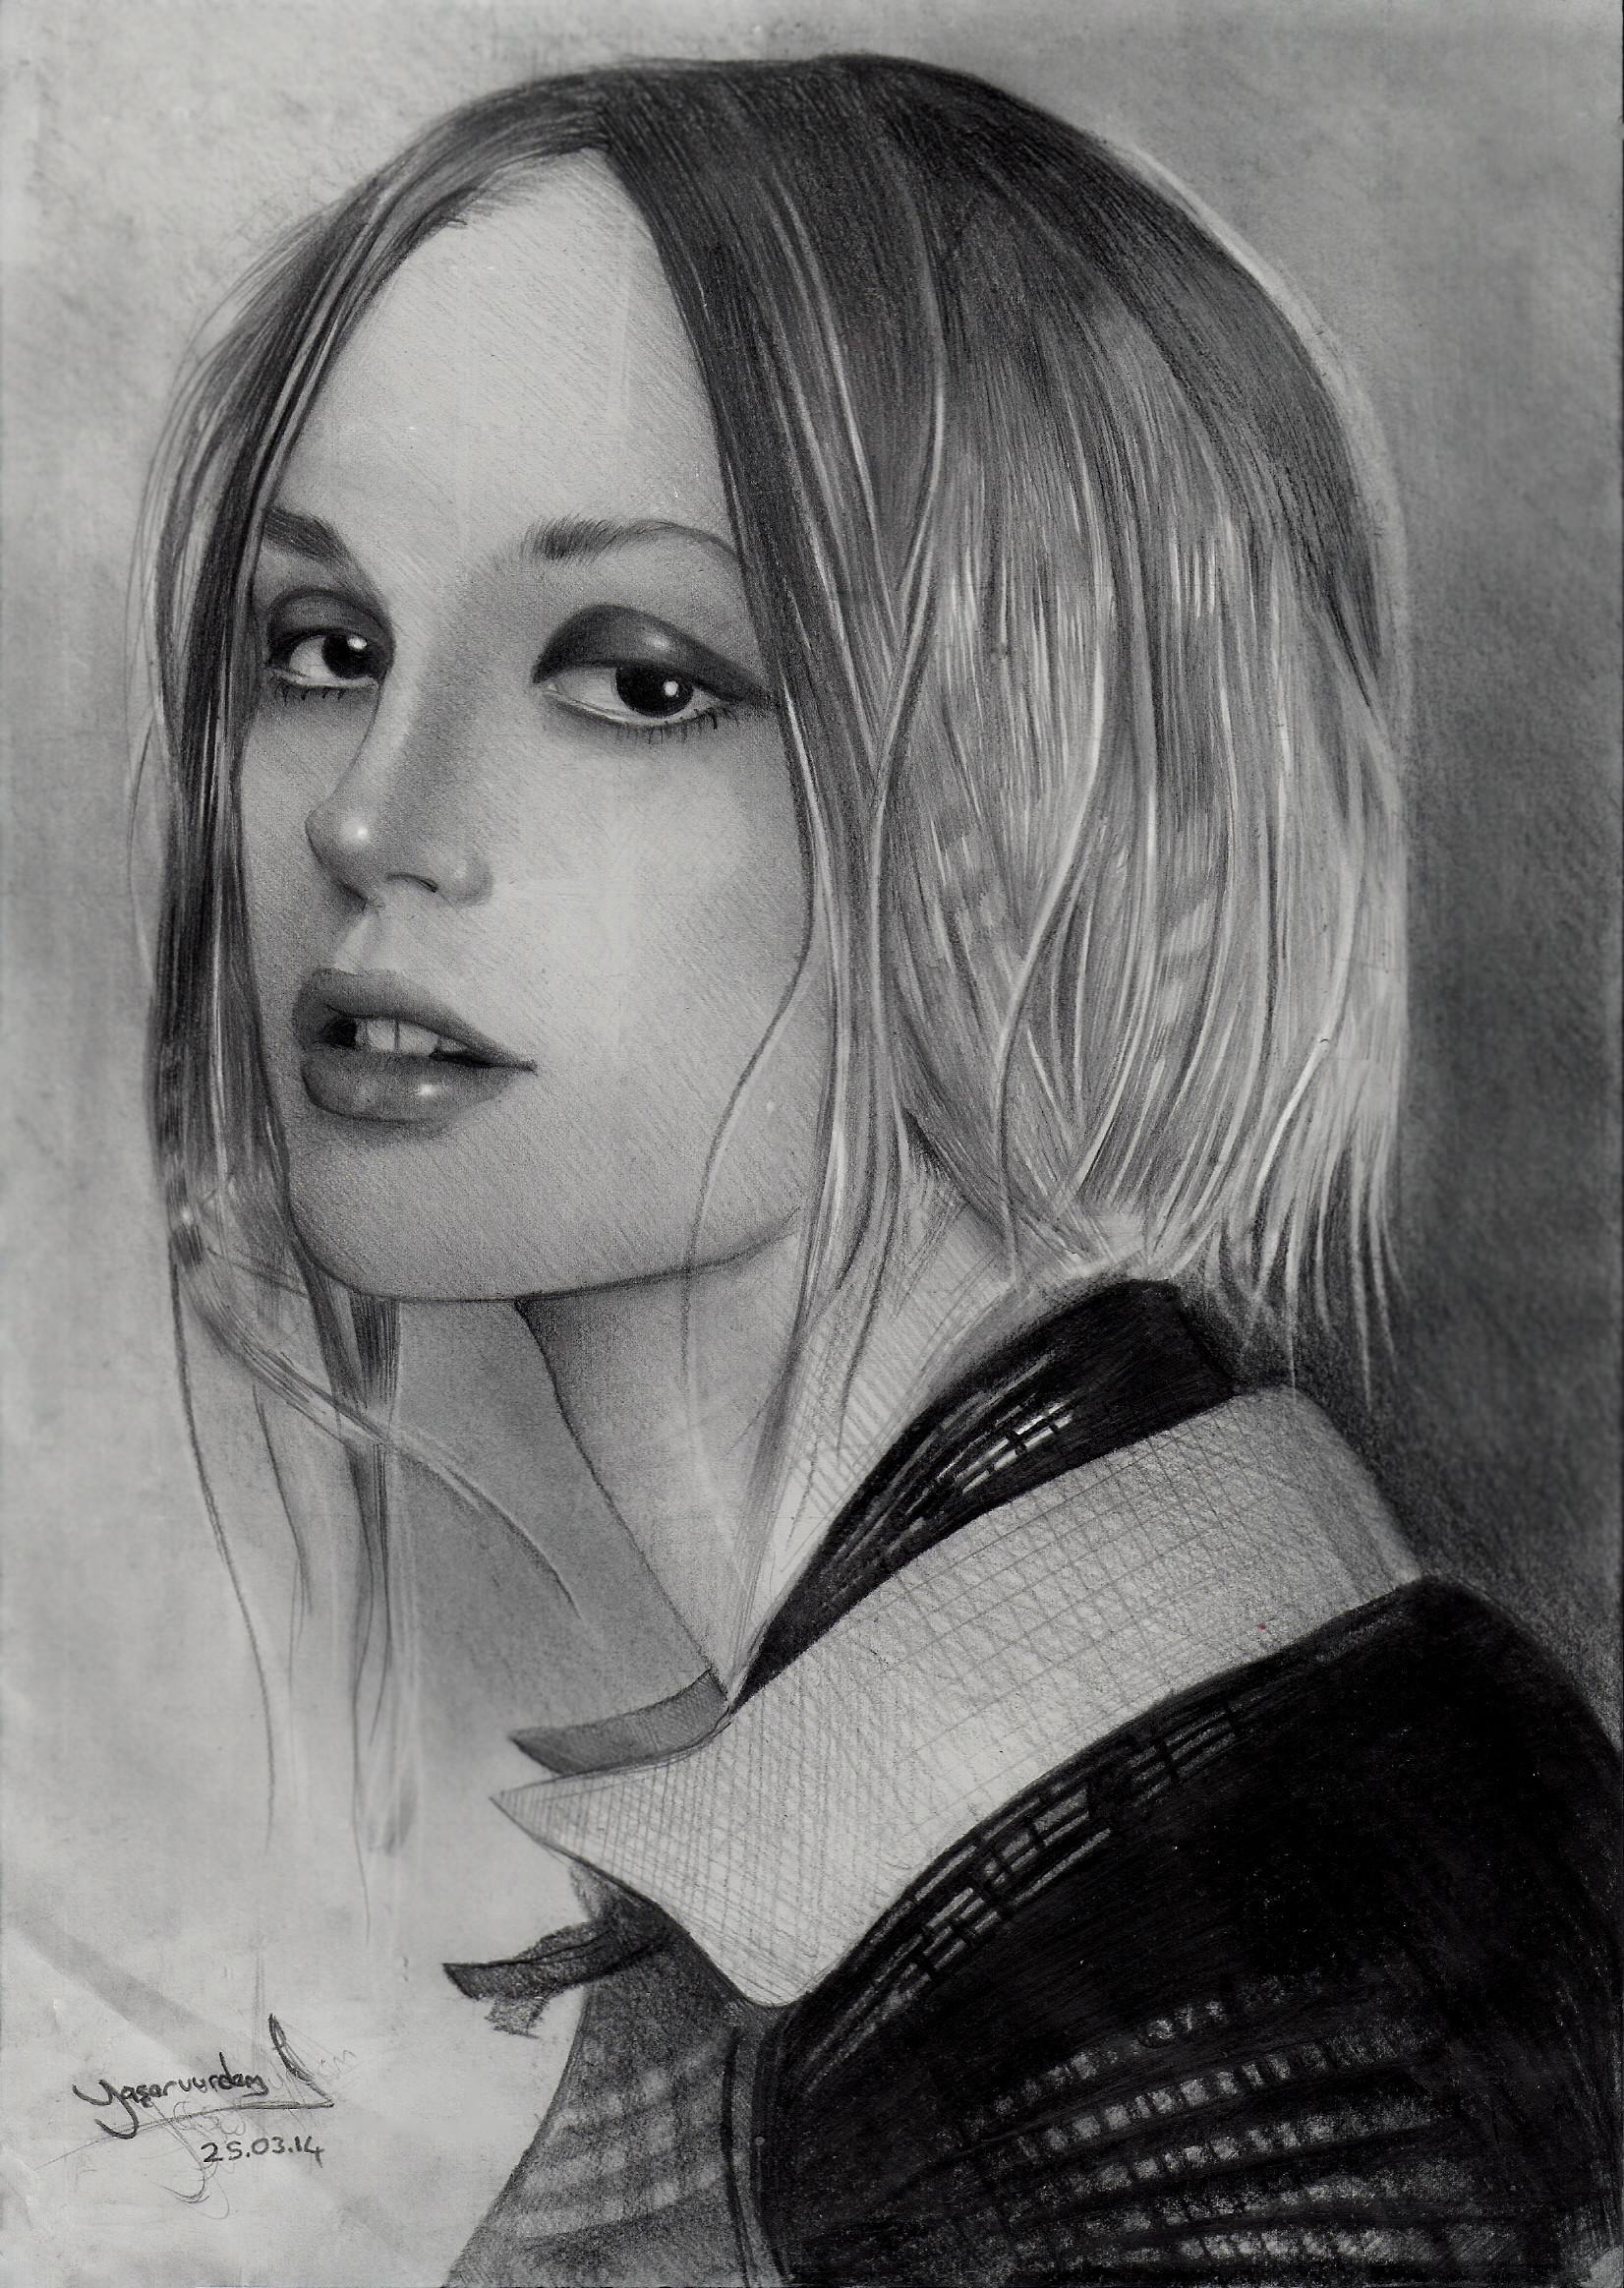 Yasar vurdem model portrait by vurdem d7bmyth